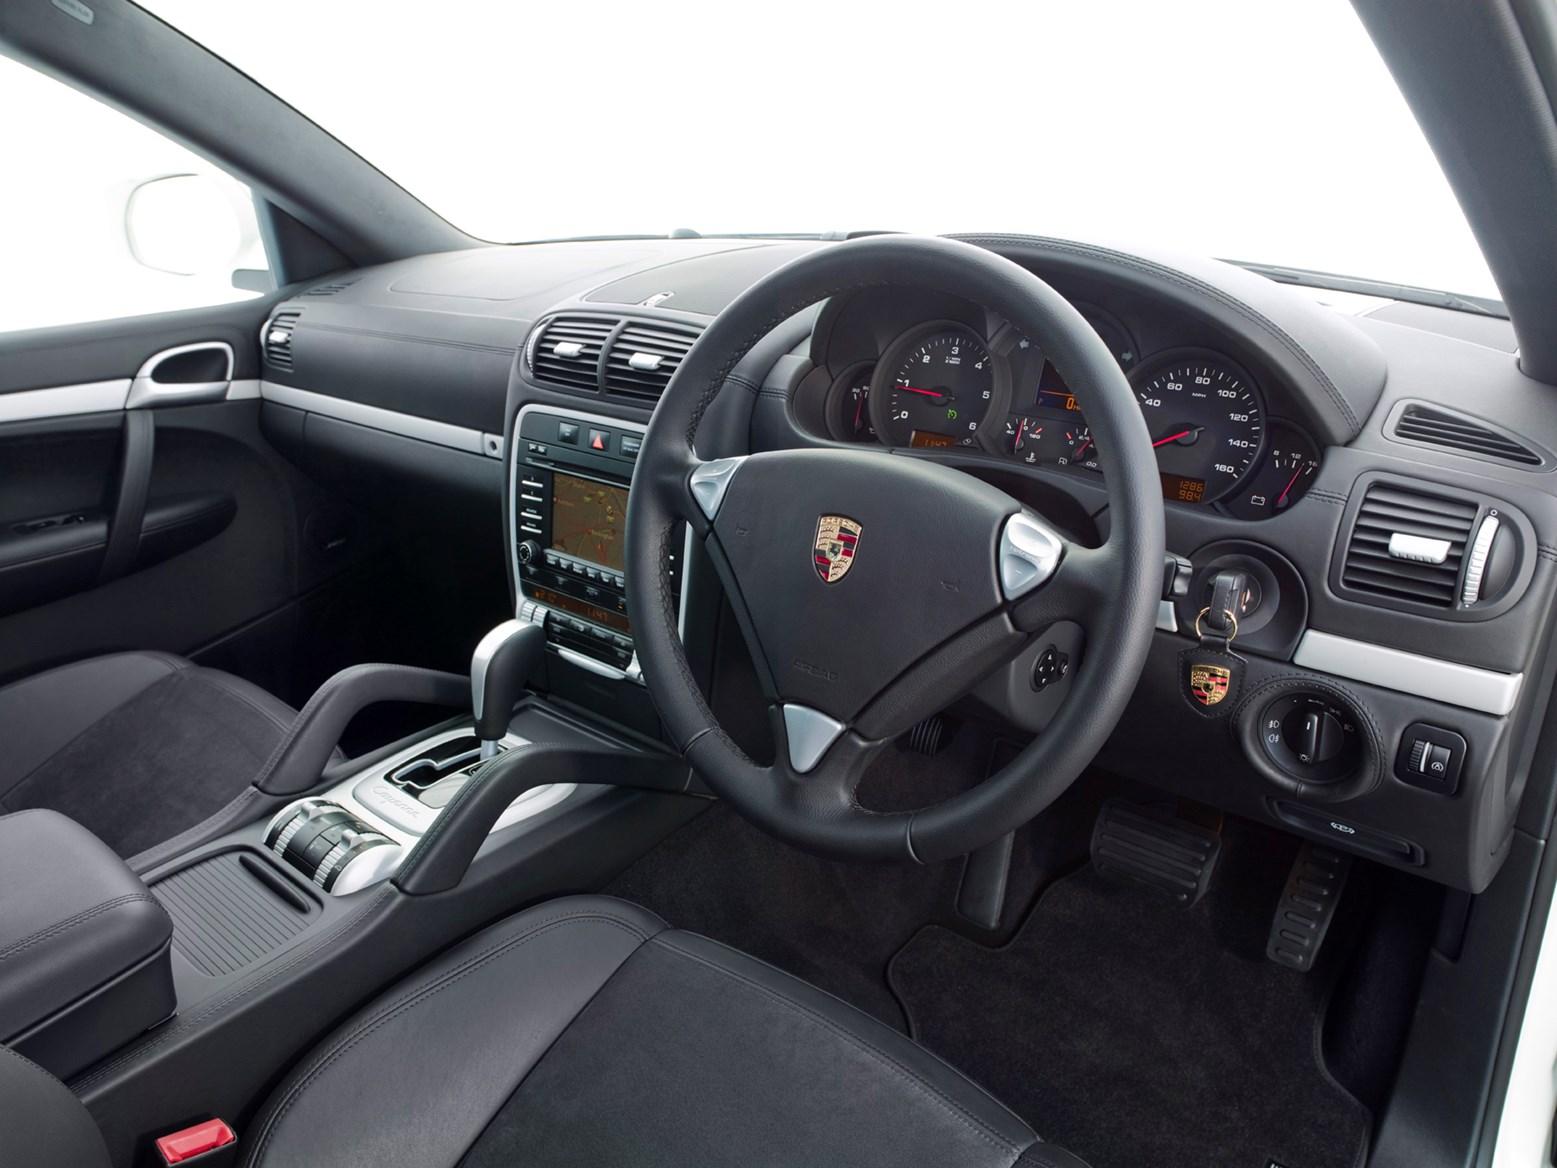 Used Porsche Cayenne Estate (2003 - 2009) MPG | Parkers